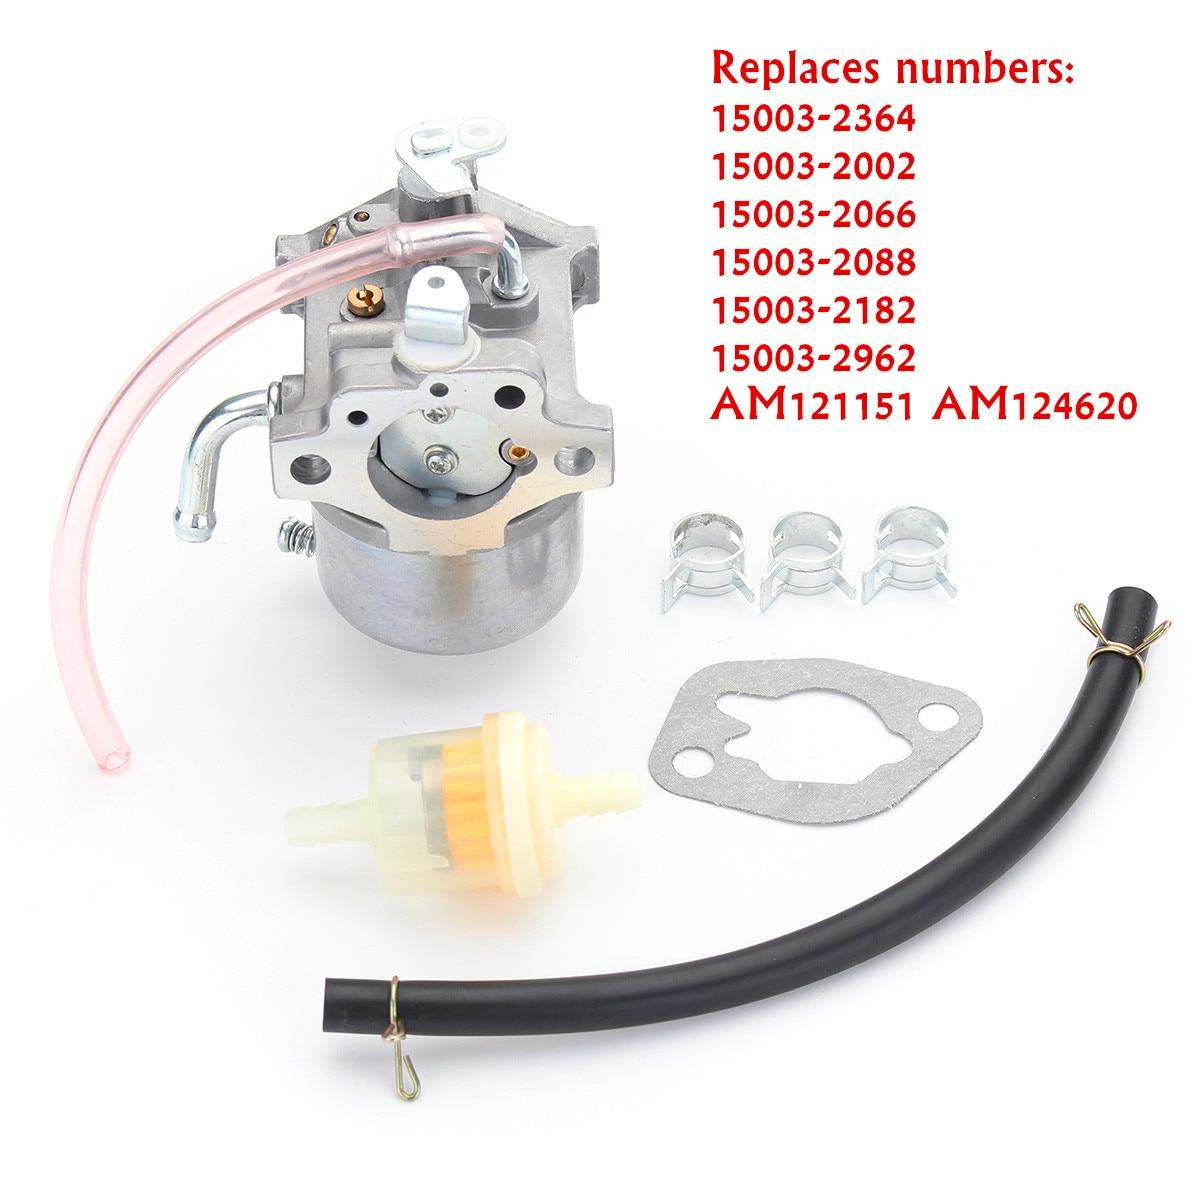 Vergaser 4 Hub Motor Kit Für Kawasaki FC150V BS50 ES50 ES58 FS58 AS03 4 Hub Engin